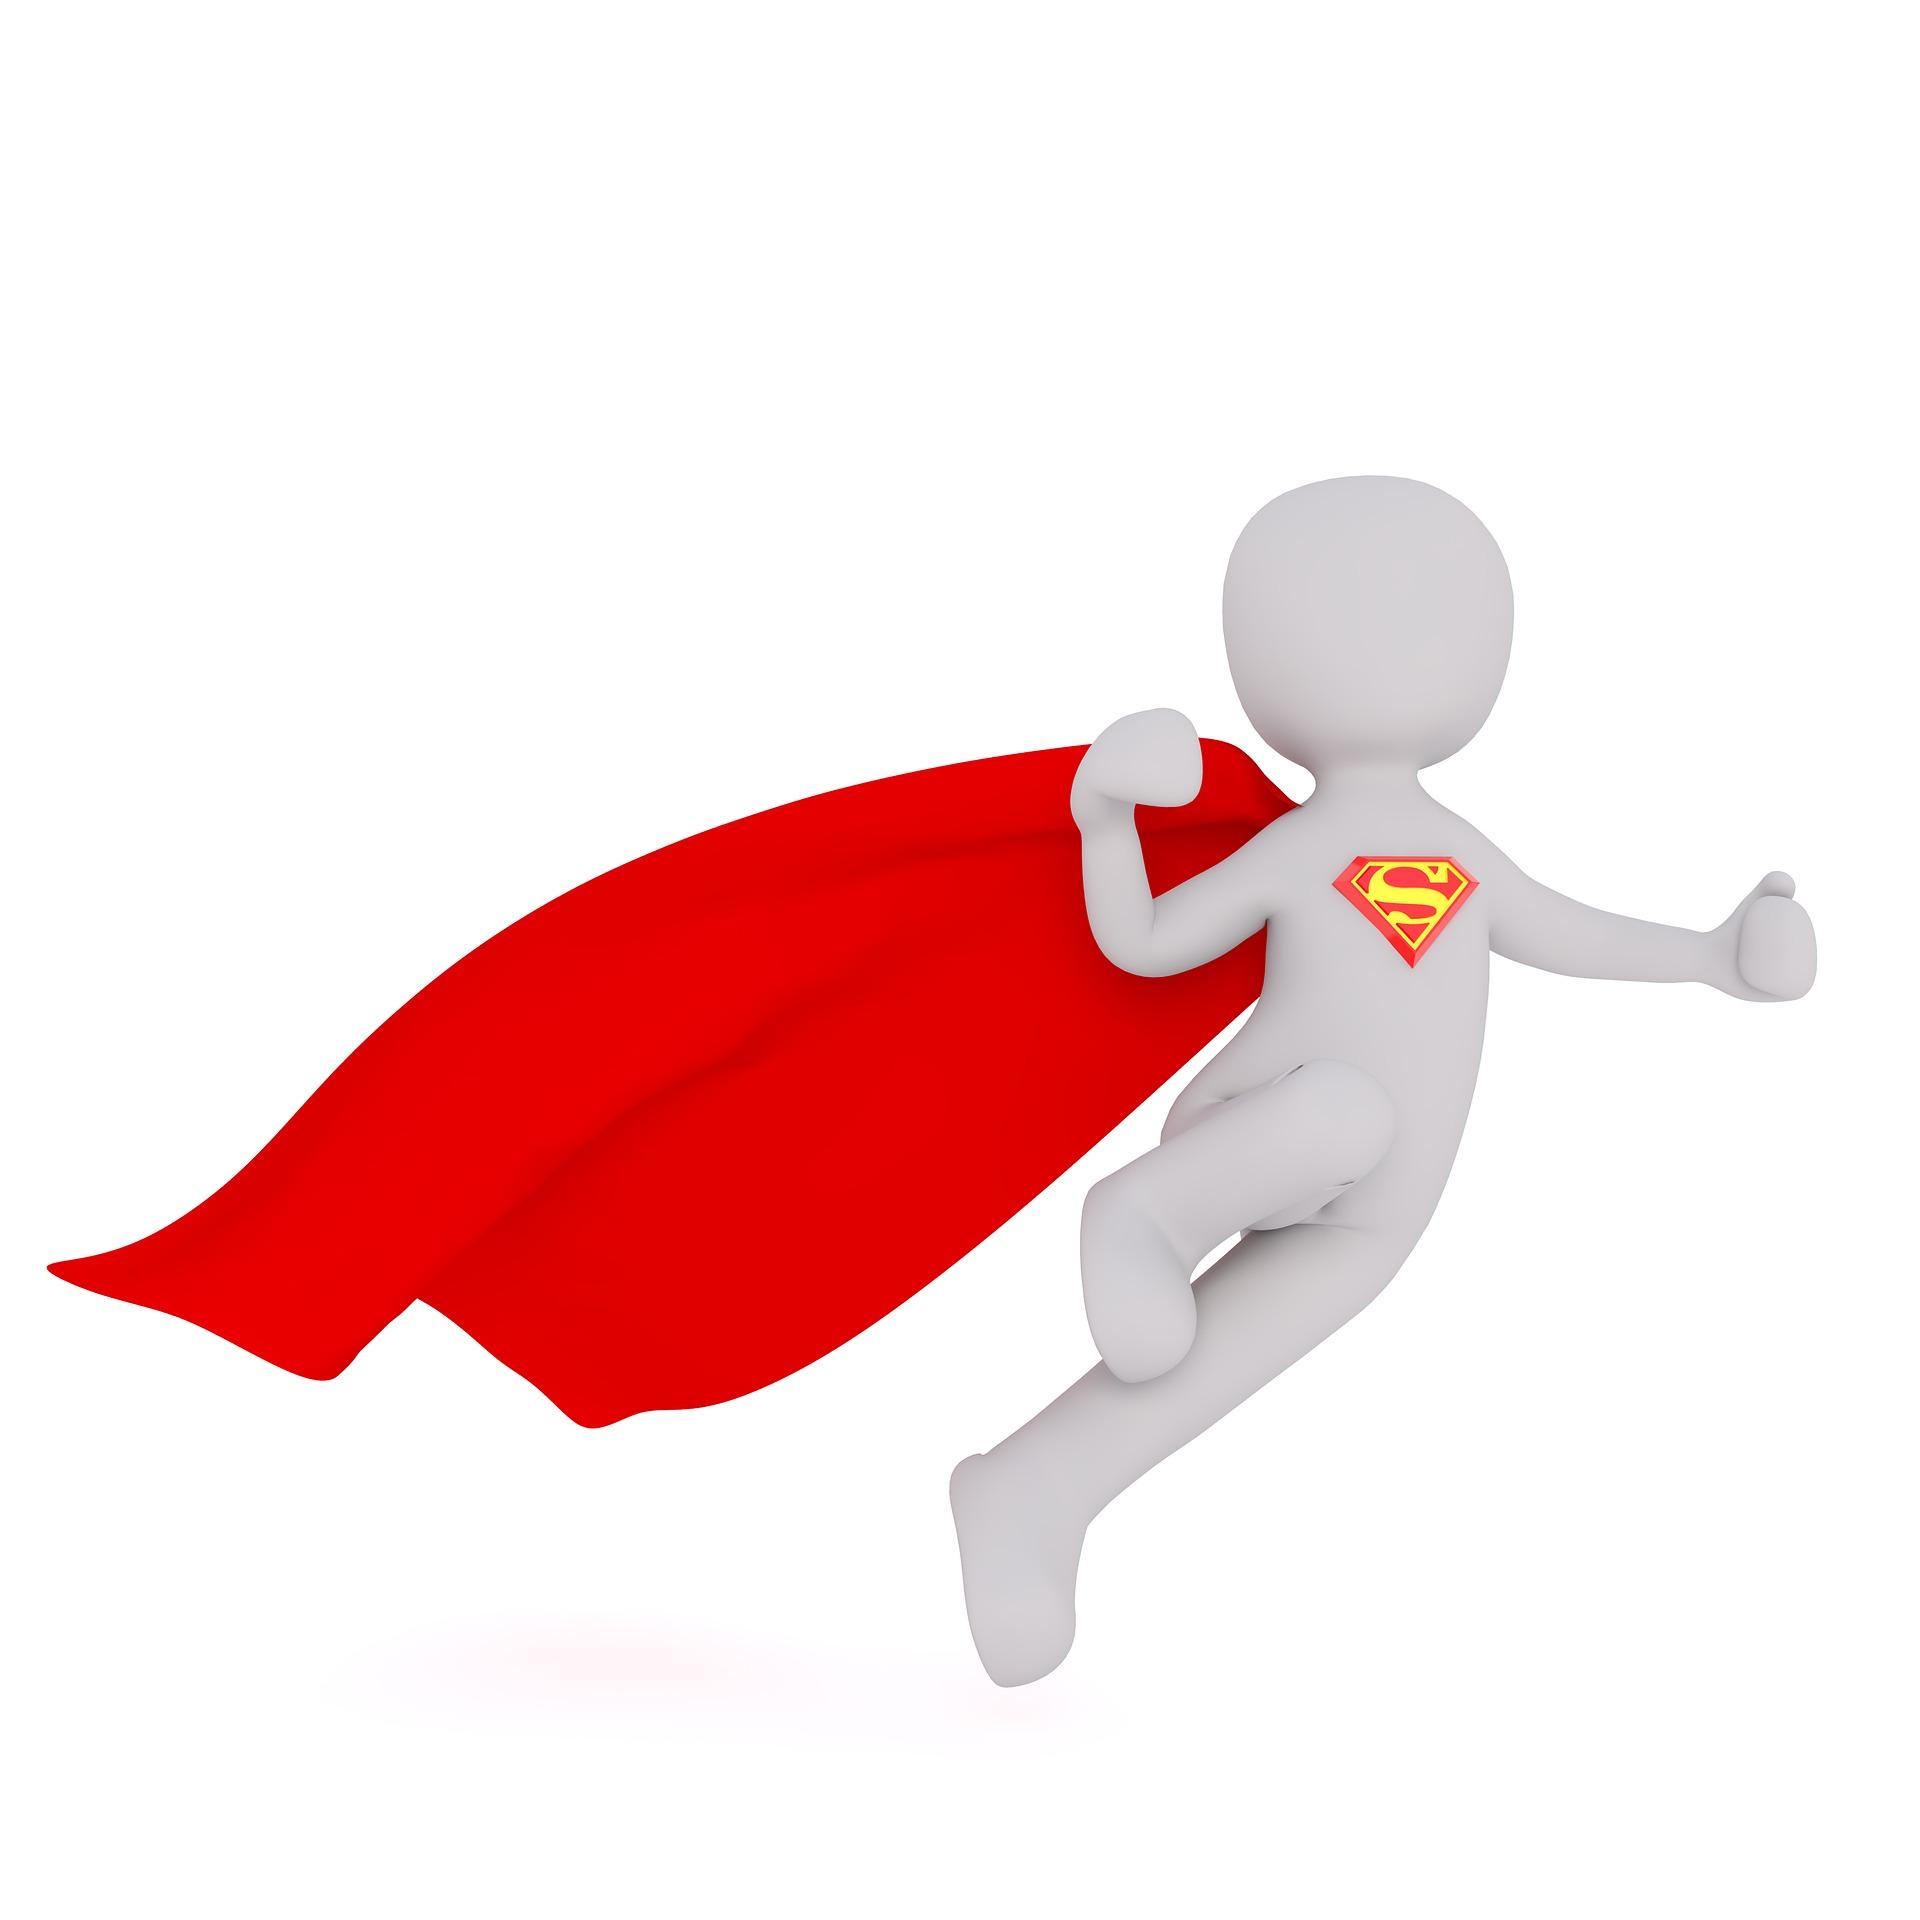 superman-1825726_1920